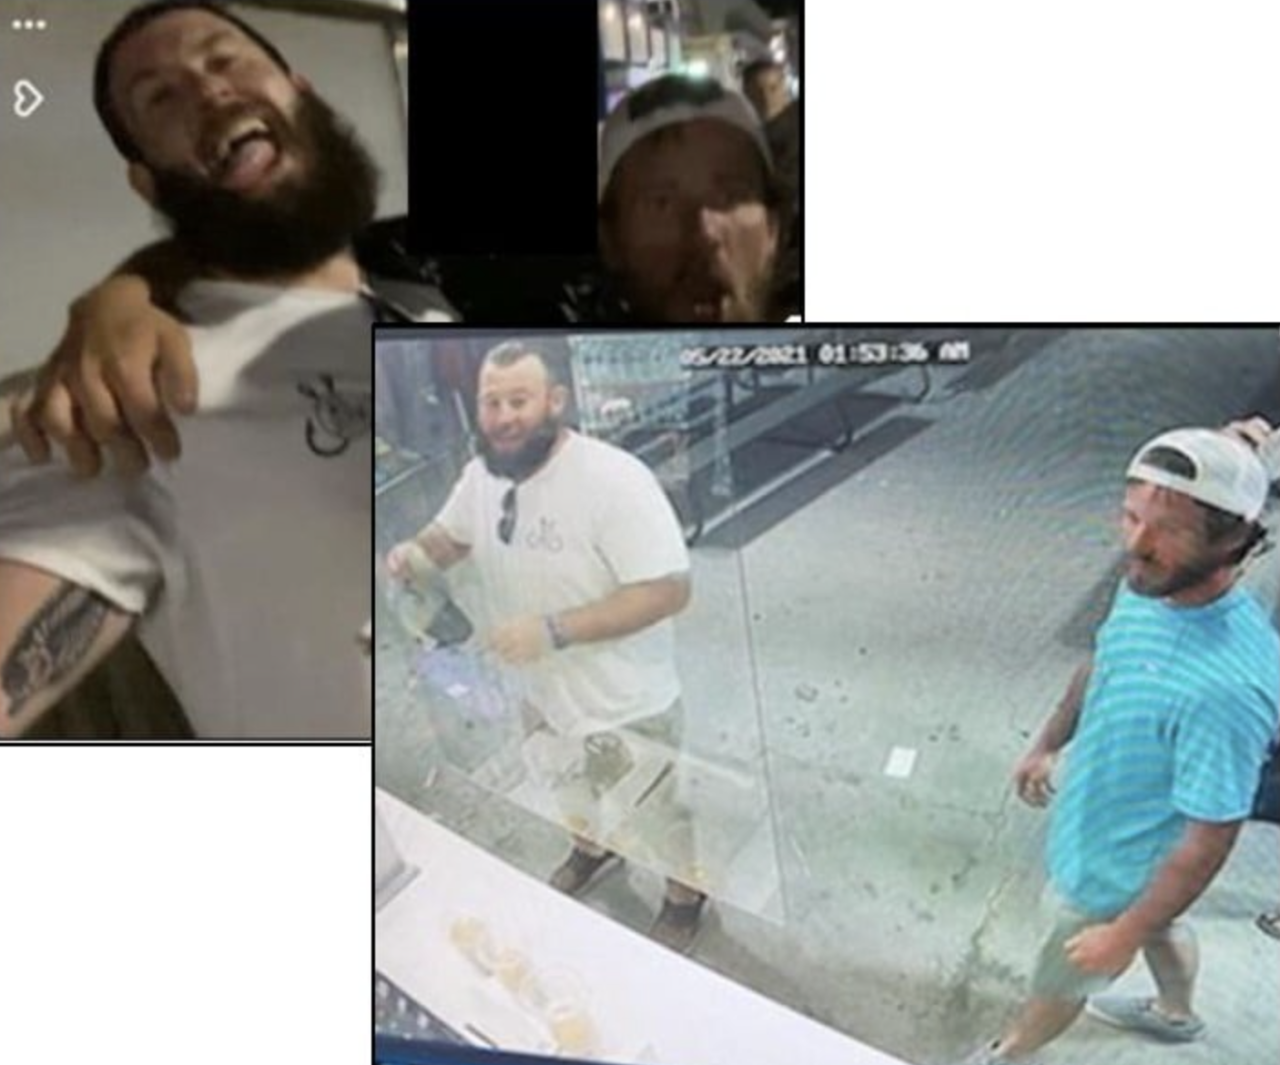 OC Boardwalk assault suspects?